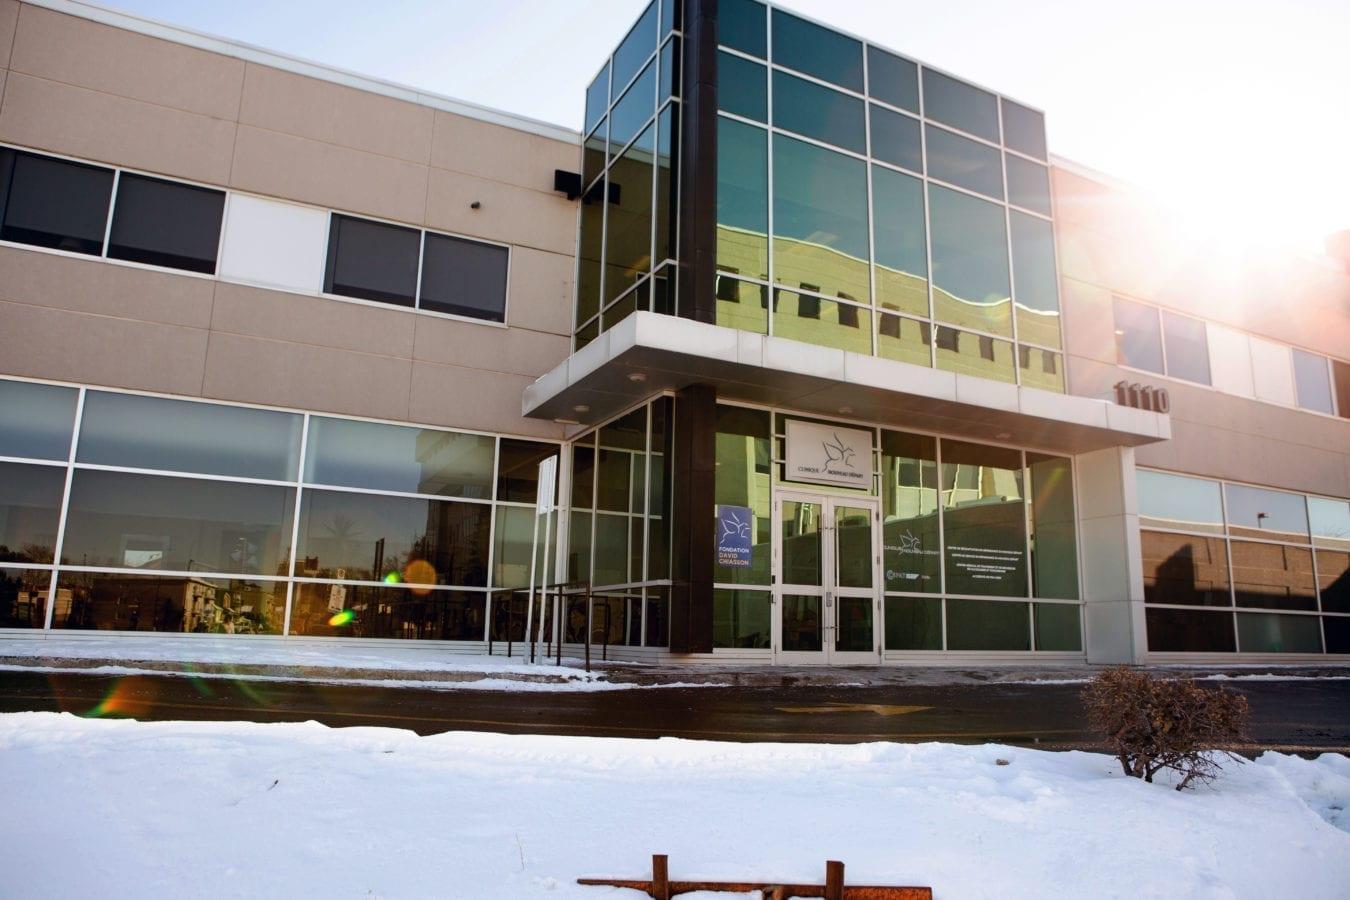 EHN Canada Clinique Nouveau Depart Addiction Treatment Facility